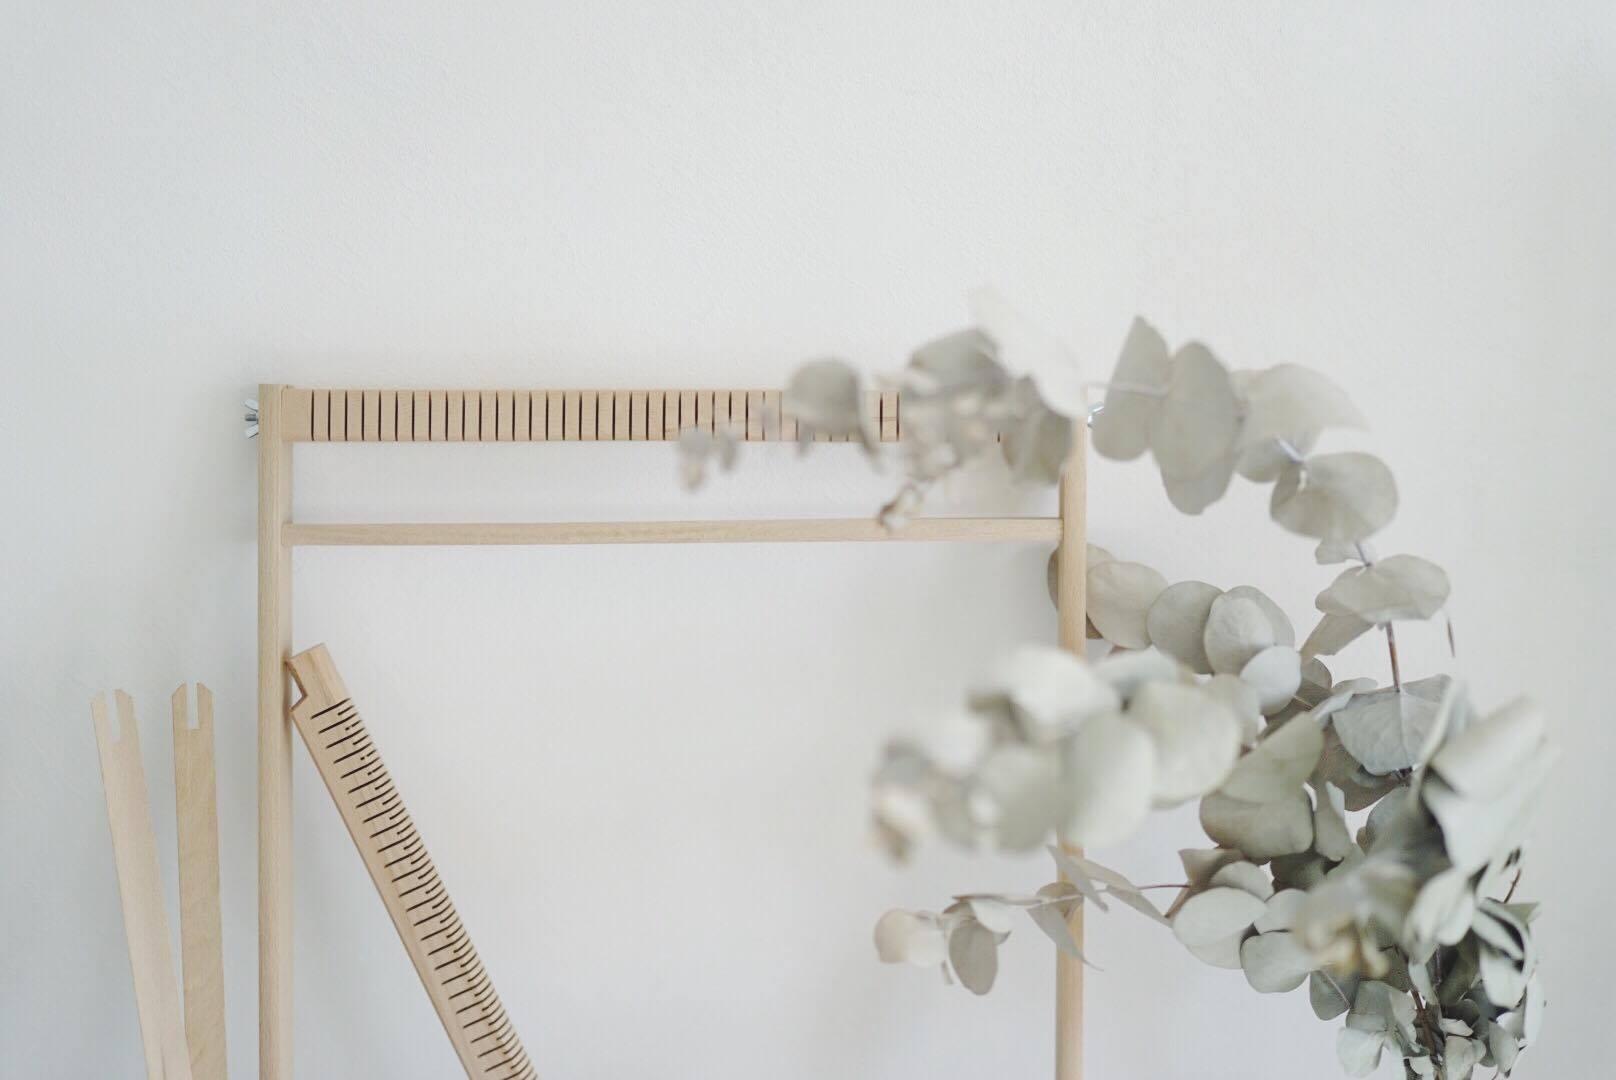 Atelier tissage Julie Robert